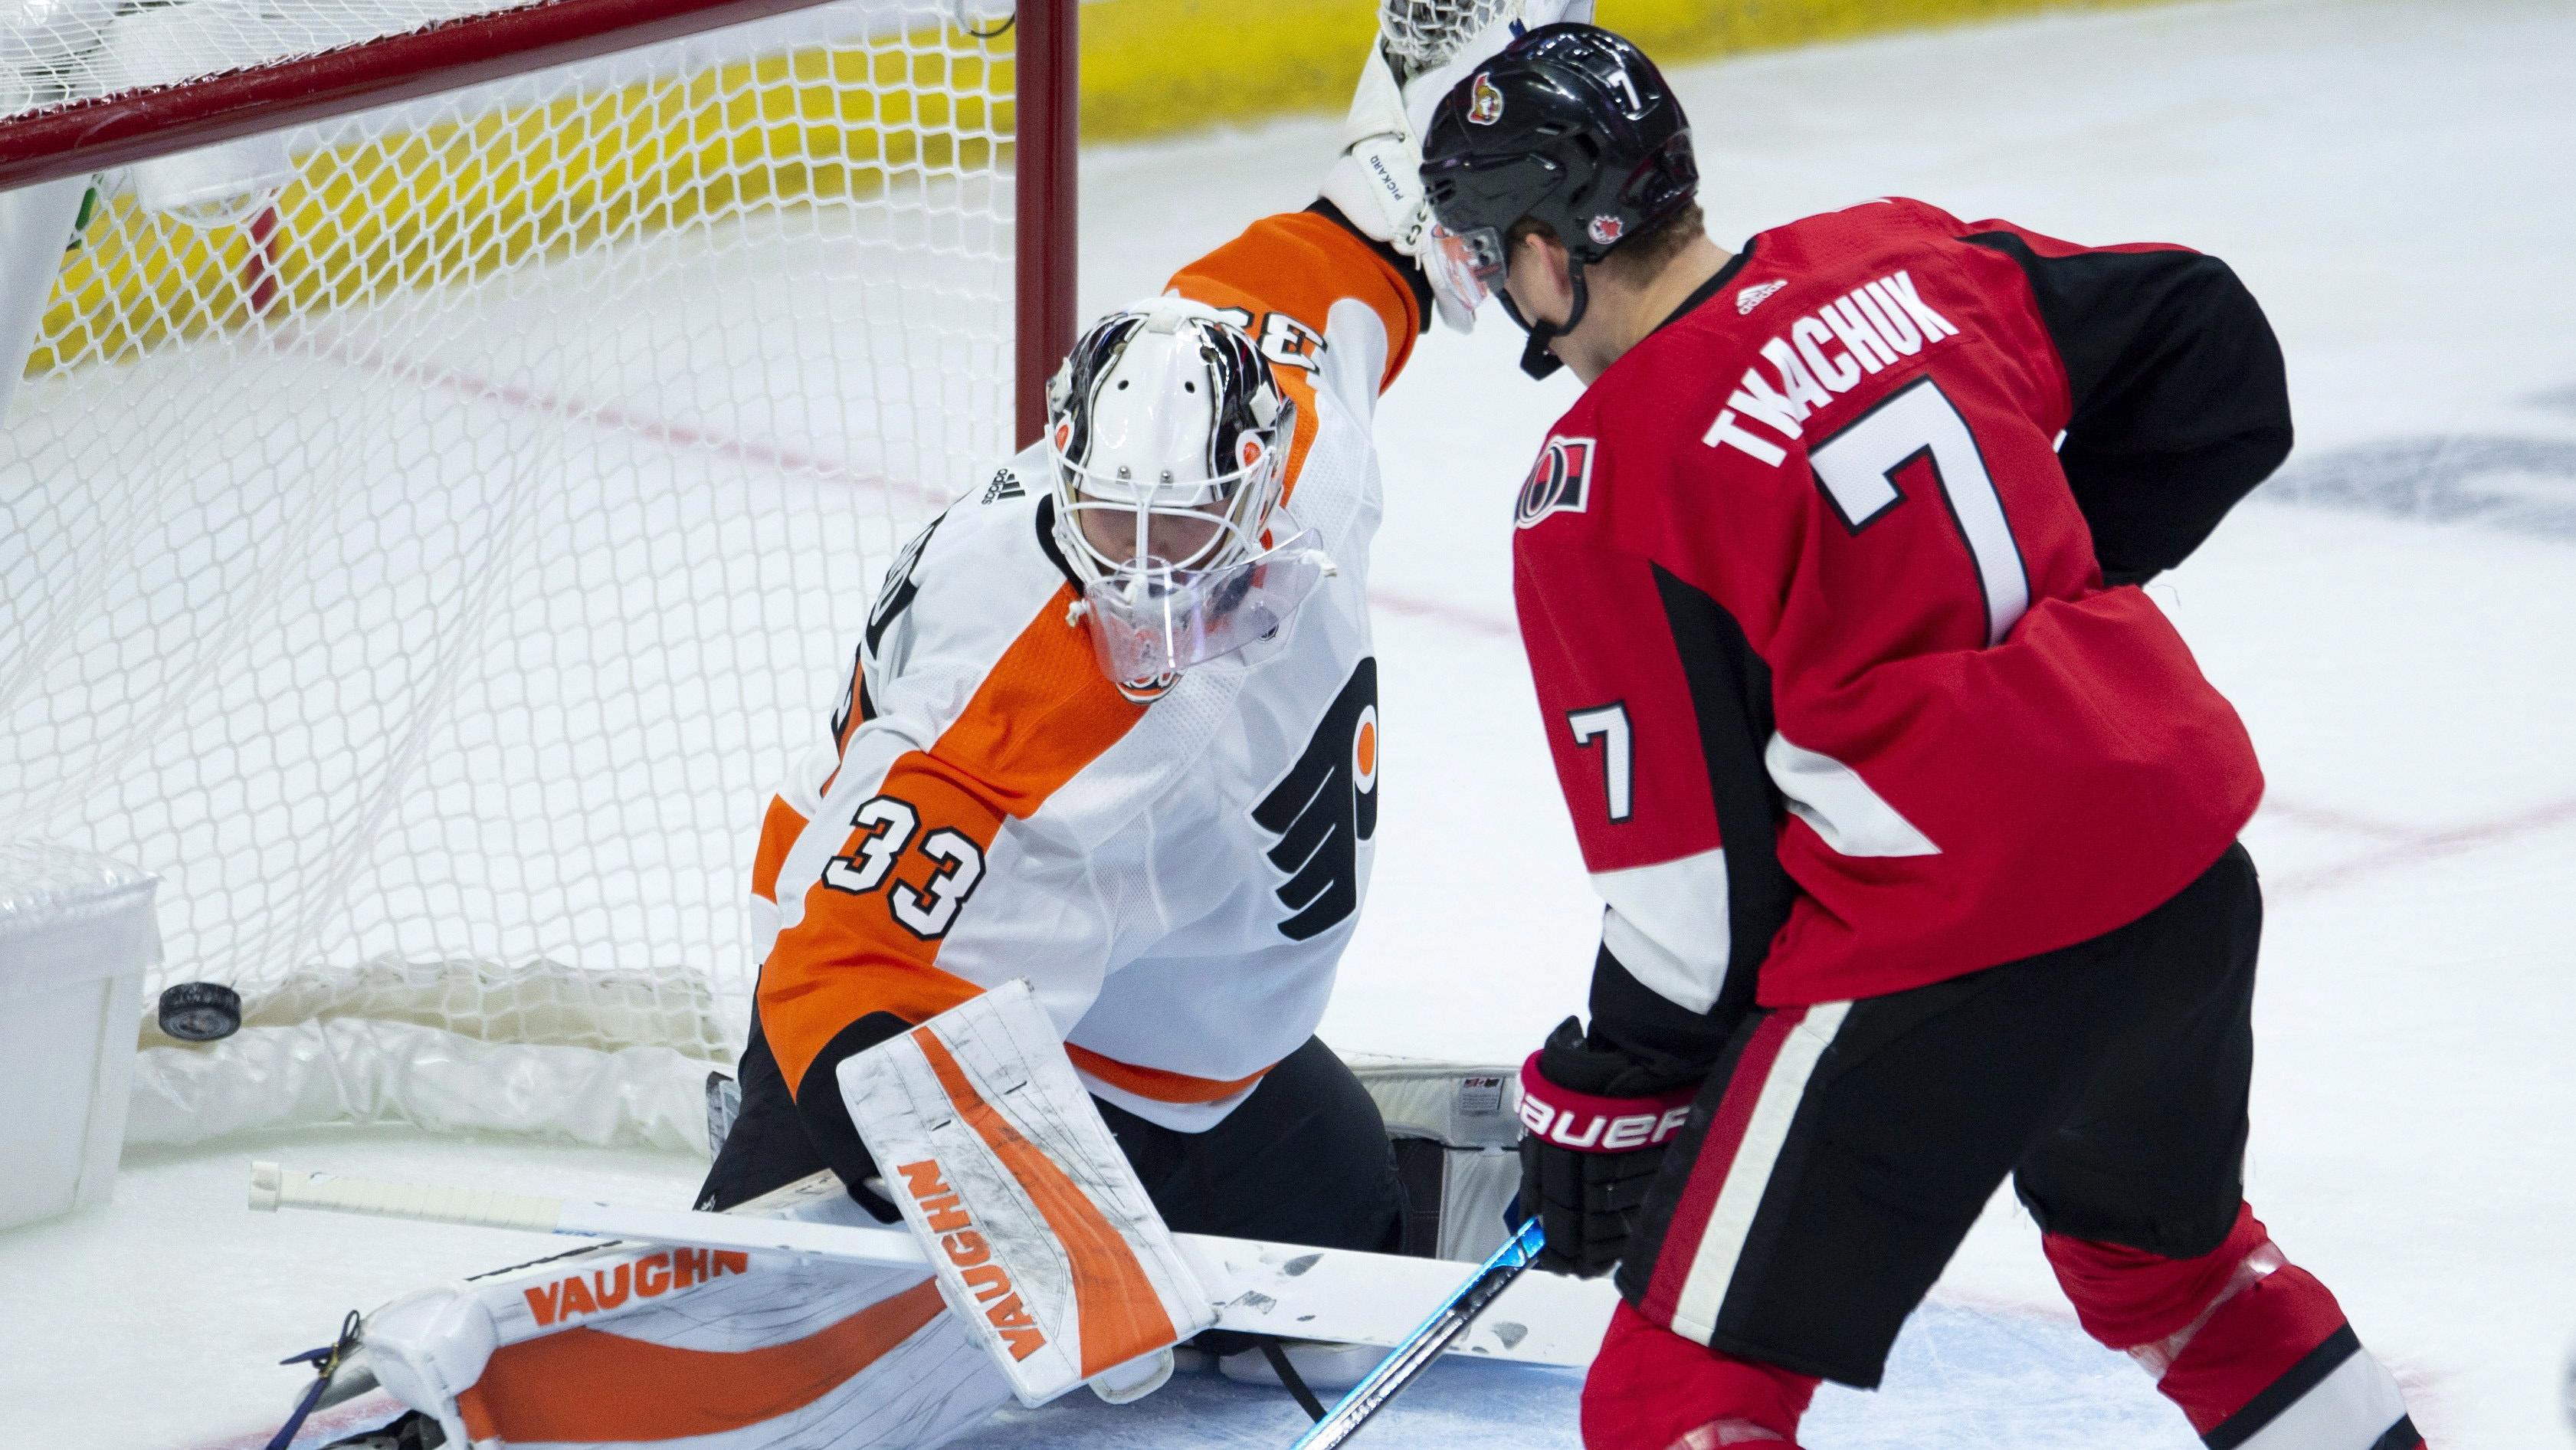 a60741b9d Brady Tkachuk scores 1st NHL goal as Senators fall to Flyers